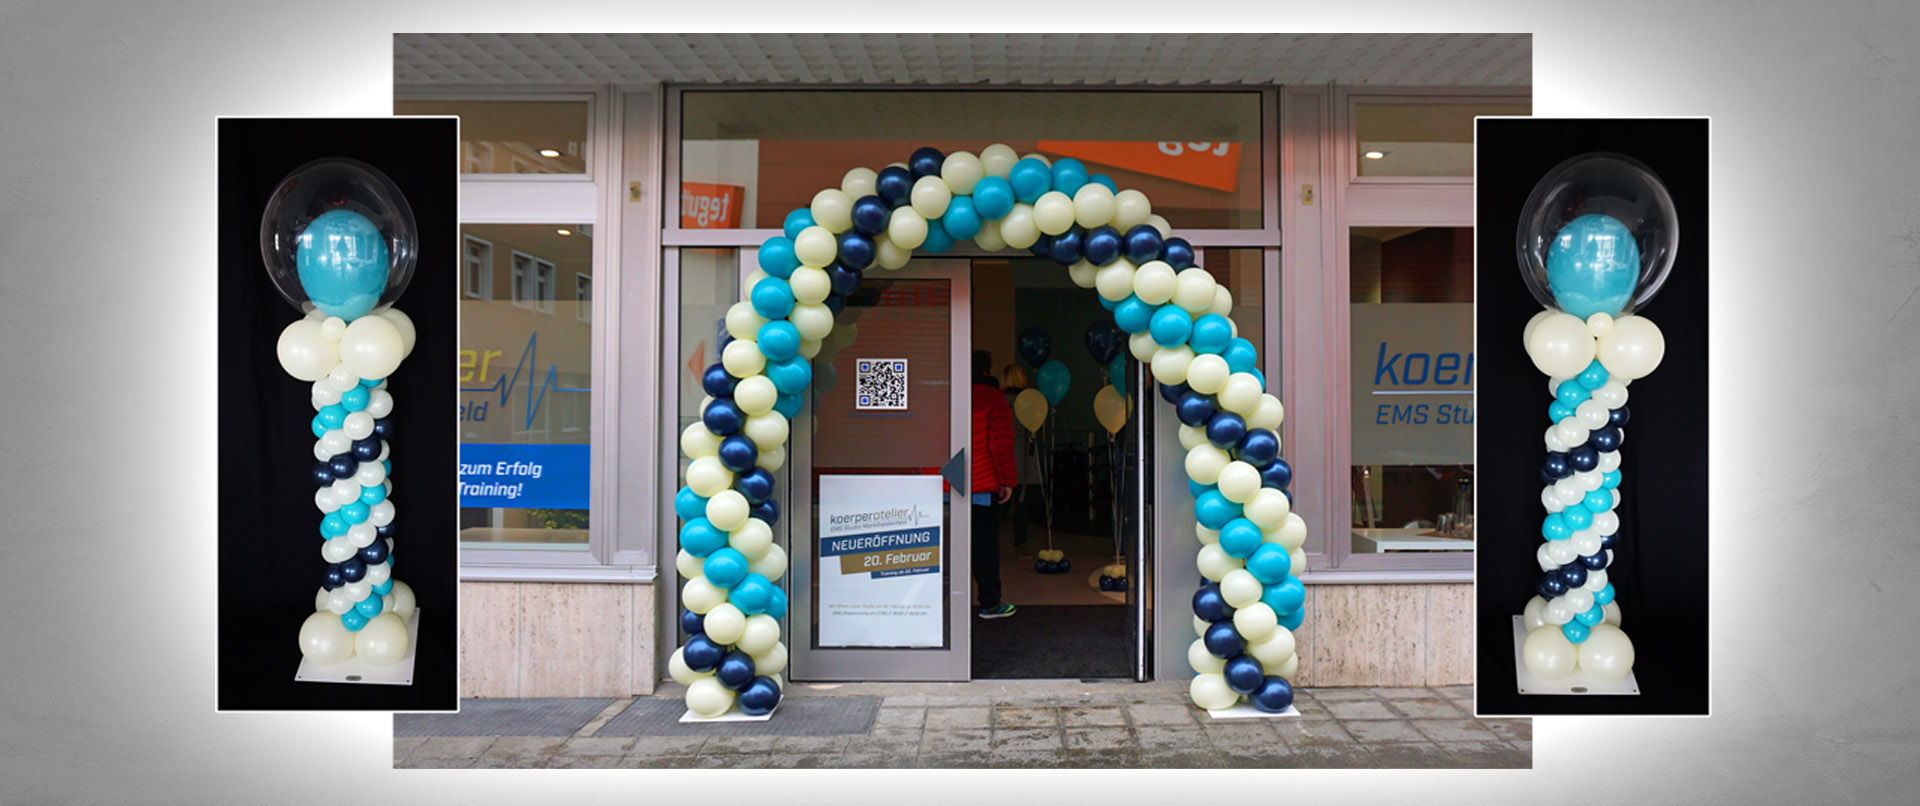 Luftballon-Dekoration Neueröffnung EMS-Studio (Fitness-Studio)